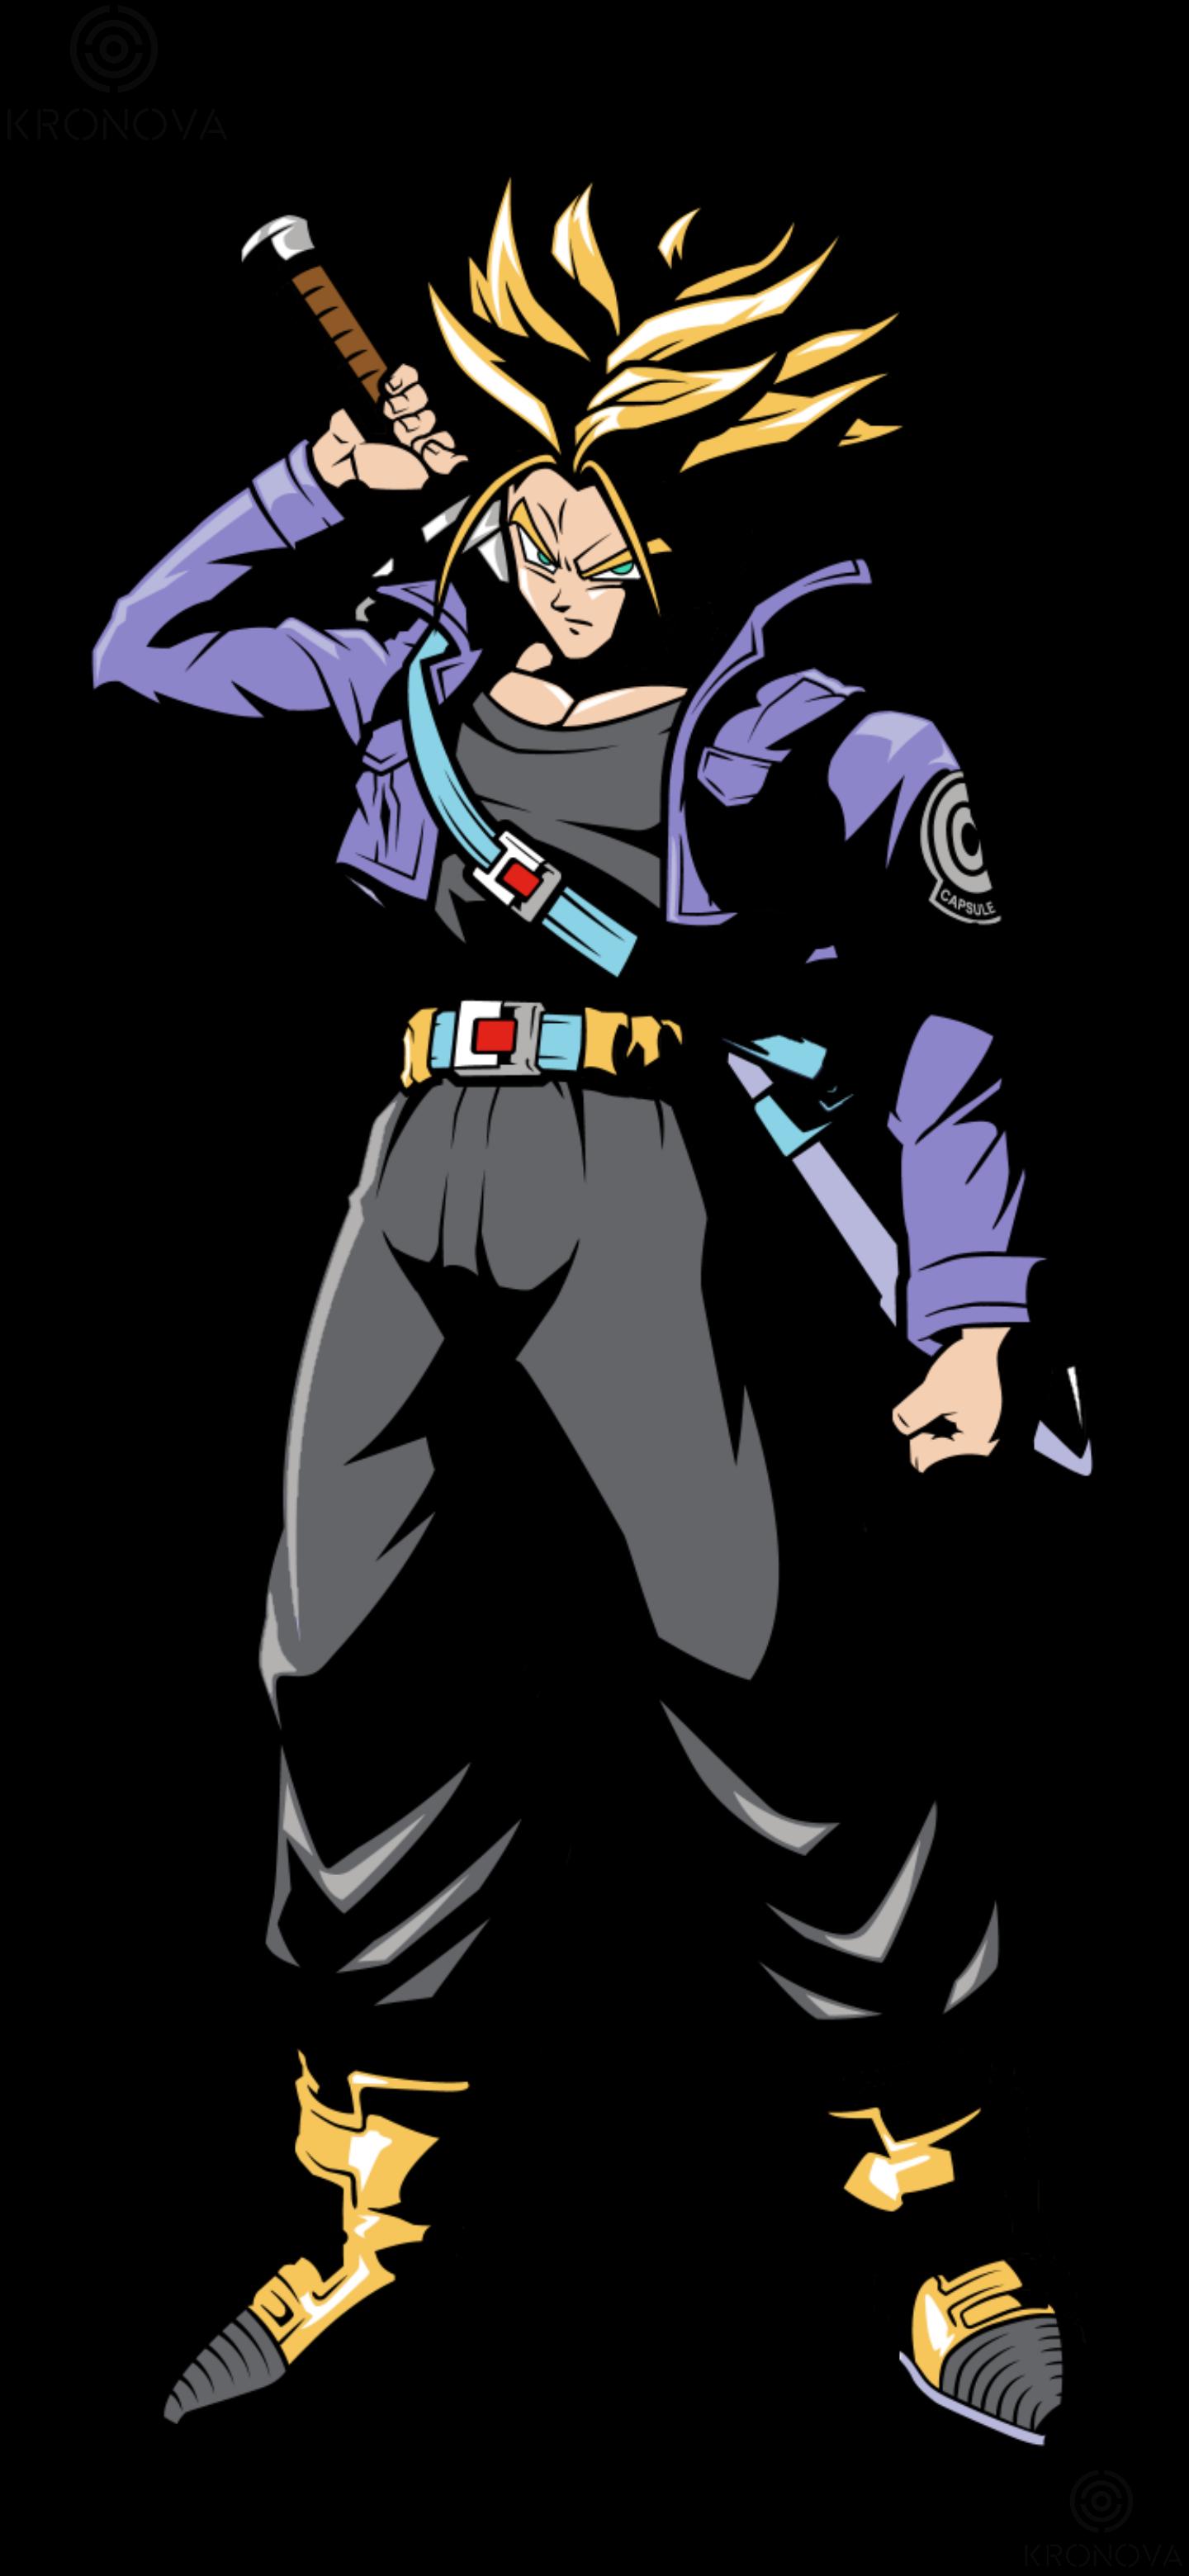 Wallpaper Bola Naga Dragon Ball Z Celana Pendek Karakter Batang Future Trunks Super Saiyan Anime Manga 1440x3120 Arg81 1943873 Hd Wallpapers Wallhere